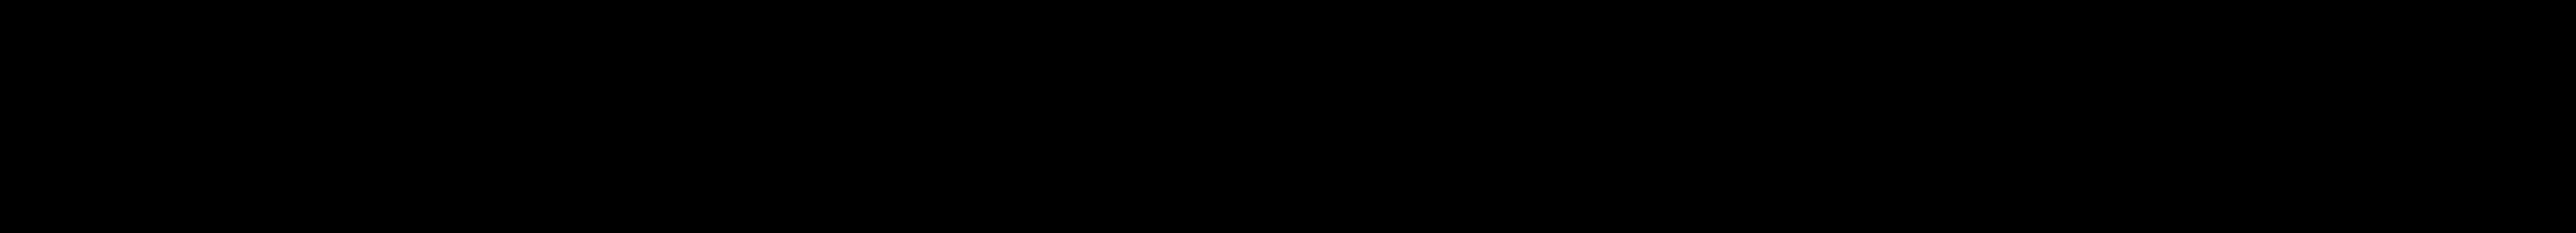 The Tallest Man On Earth Vector Logo by DutchLion